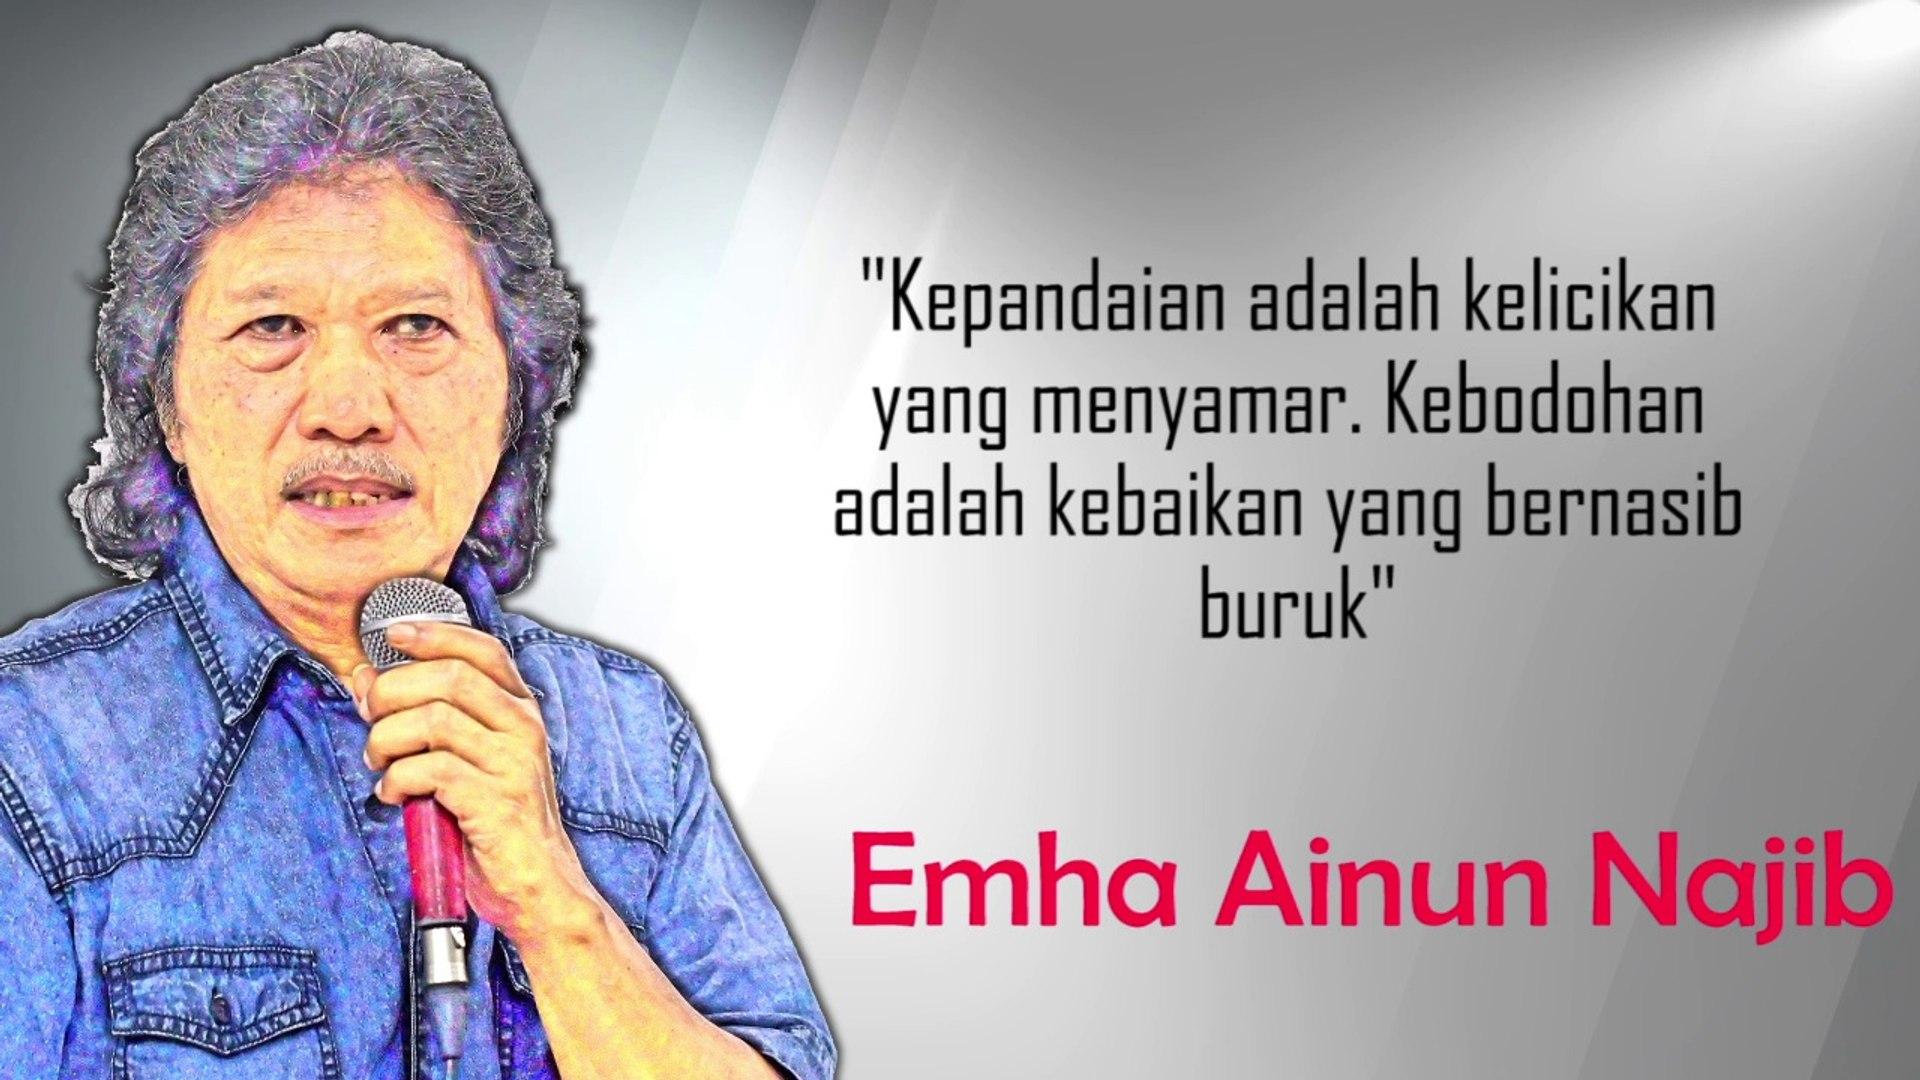 Wisdom Series Episode Emhan Ainun Najib Video Dailymotion